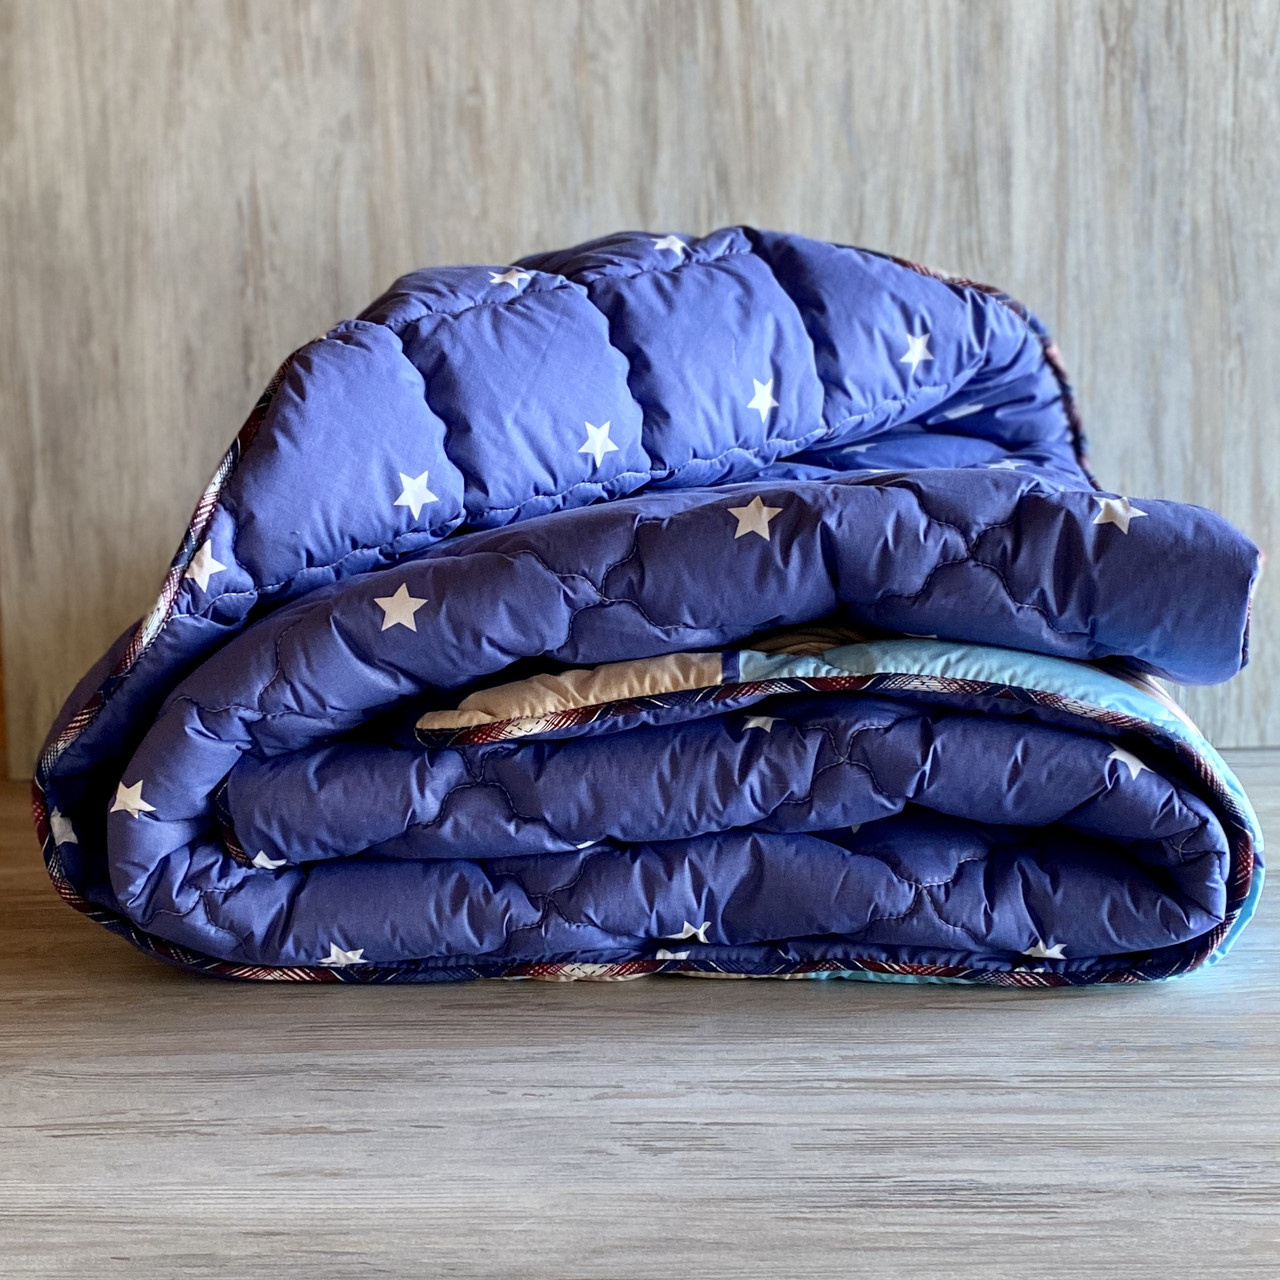 "Одеяло на овчине ""ODA"" Размер 200*220 см   Ковдра вовняна . Стеганое Евро одеяло, чехол 100% Хлопок"